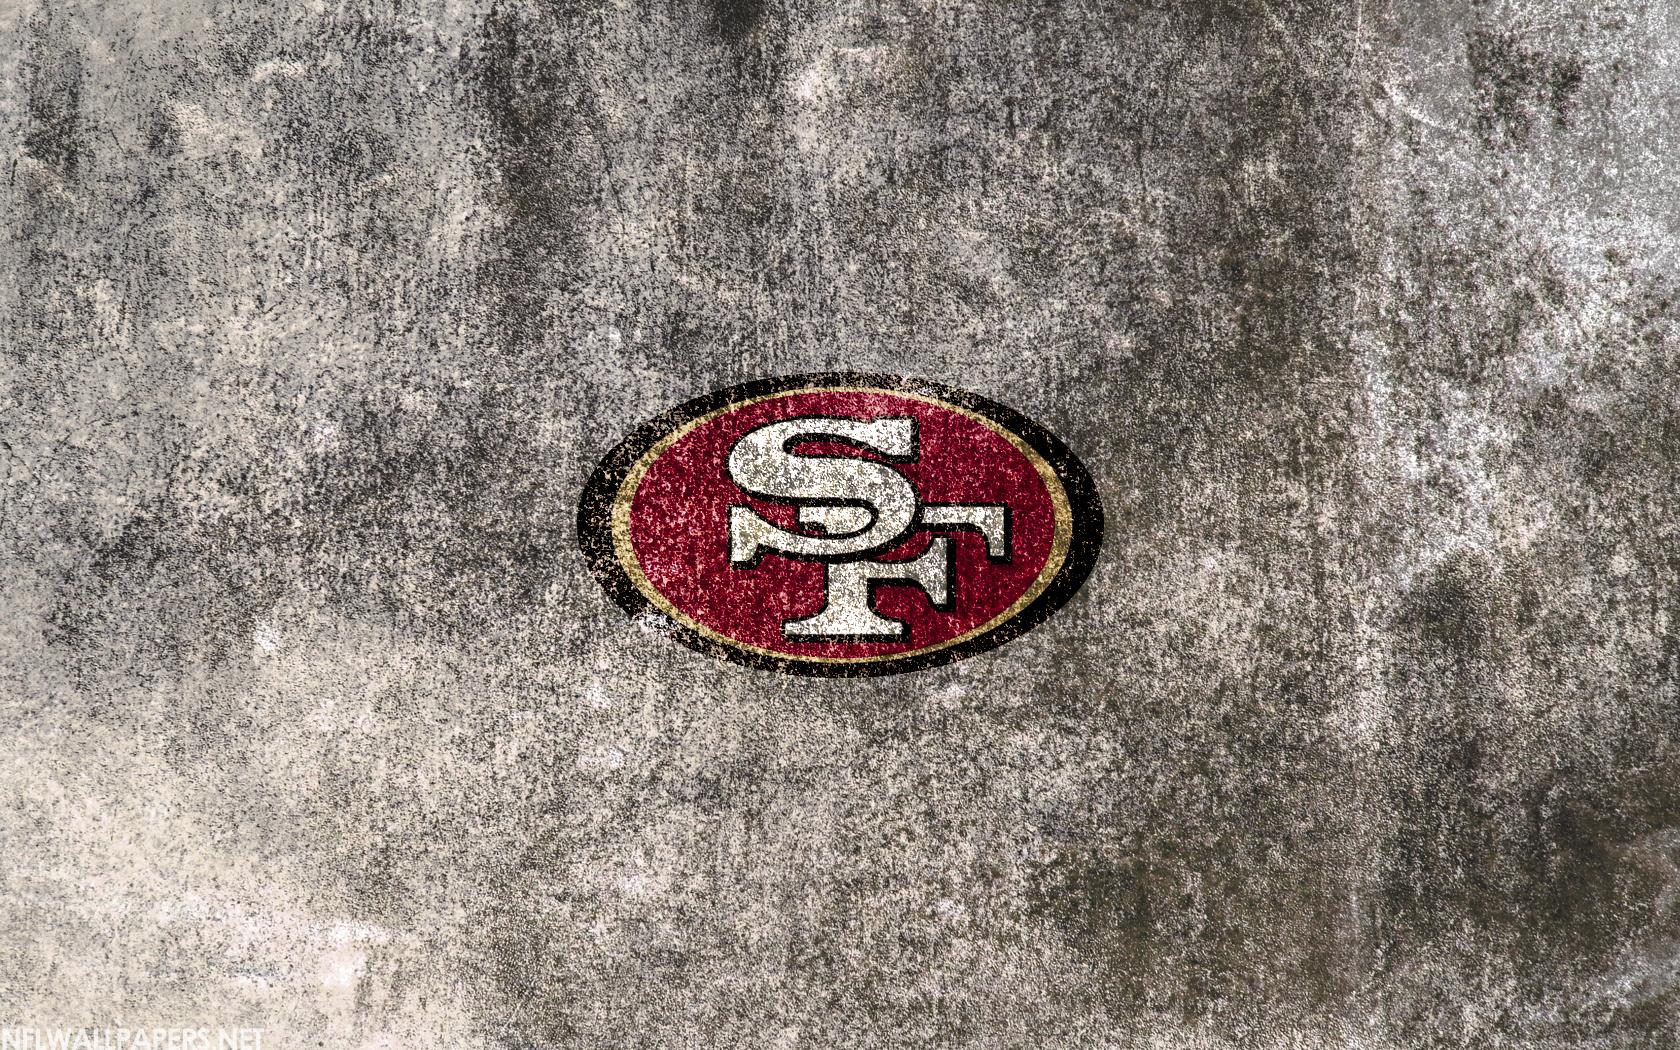 San Francisco 49ers wallpaper HD background San Francisco 49ers 1680x1050